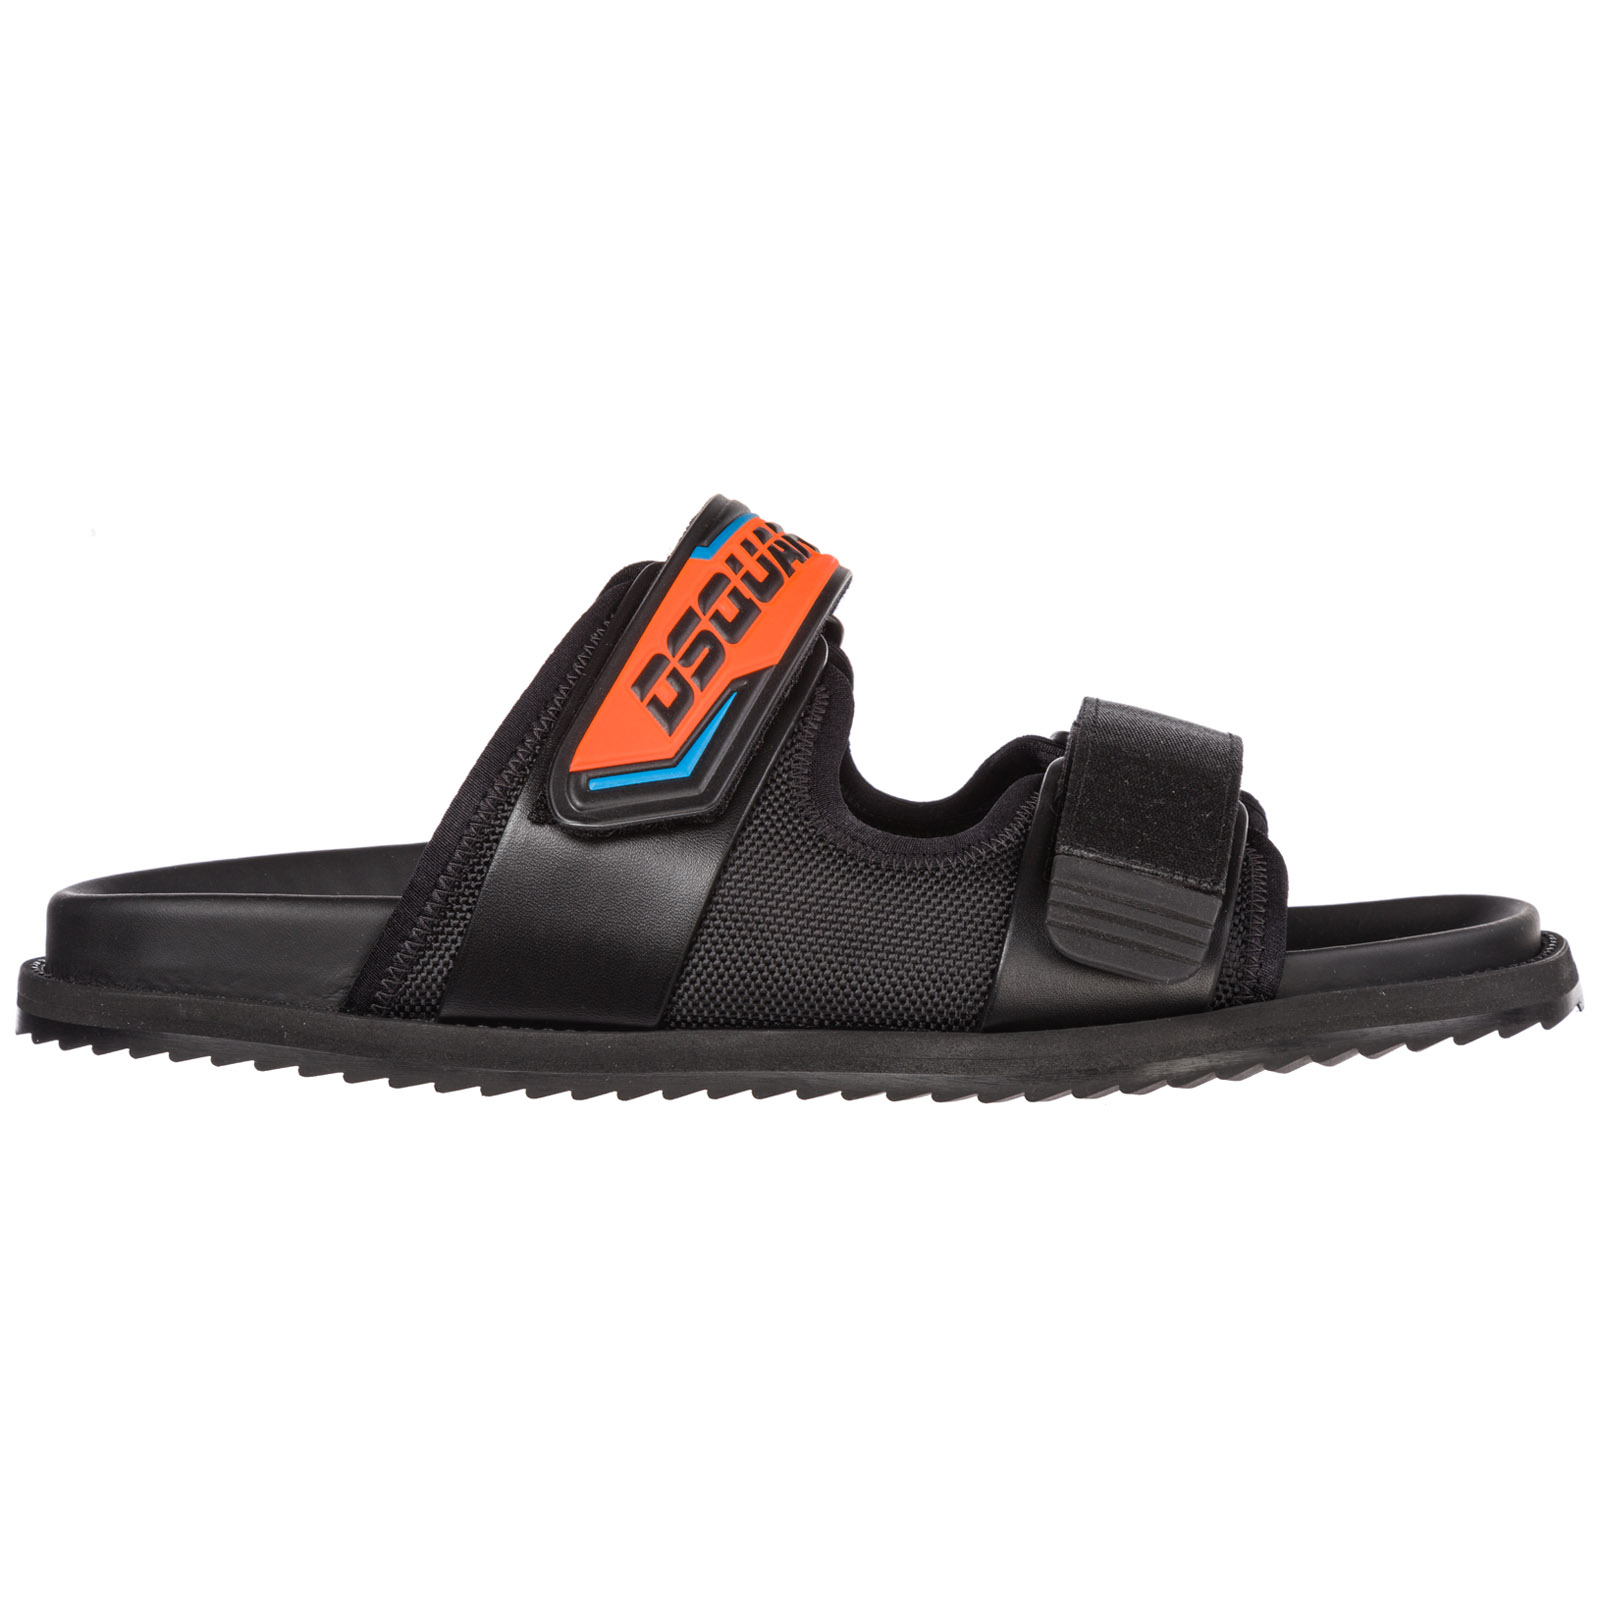 Slides Dsquared2 flat sandals